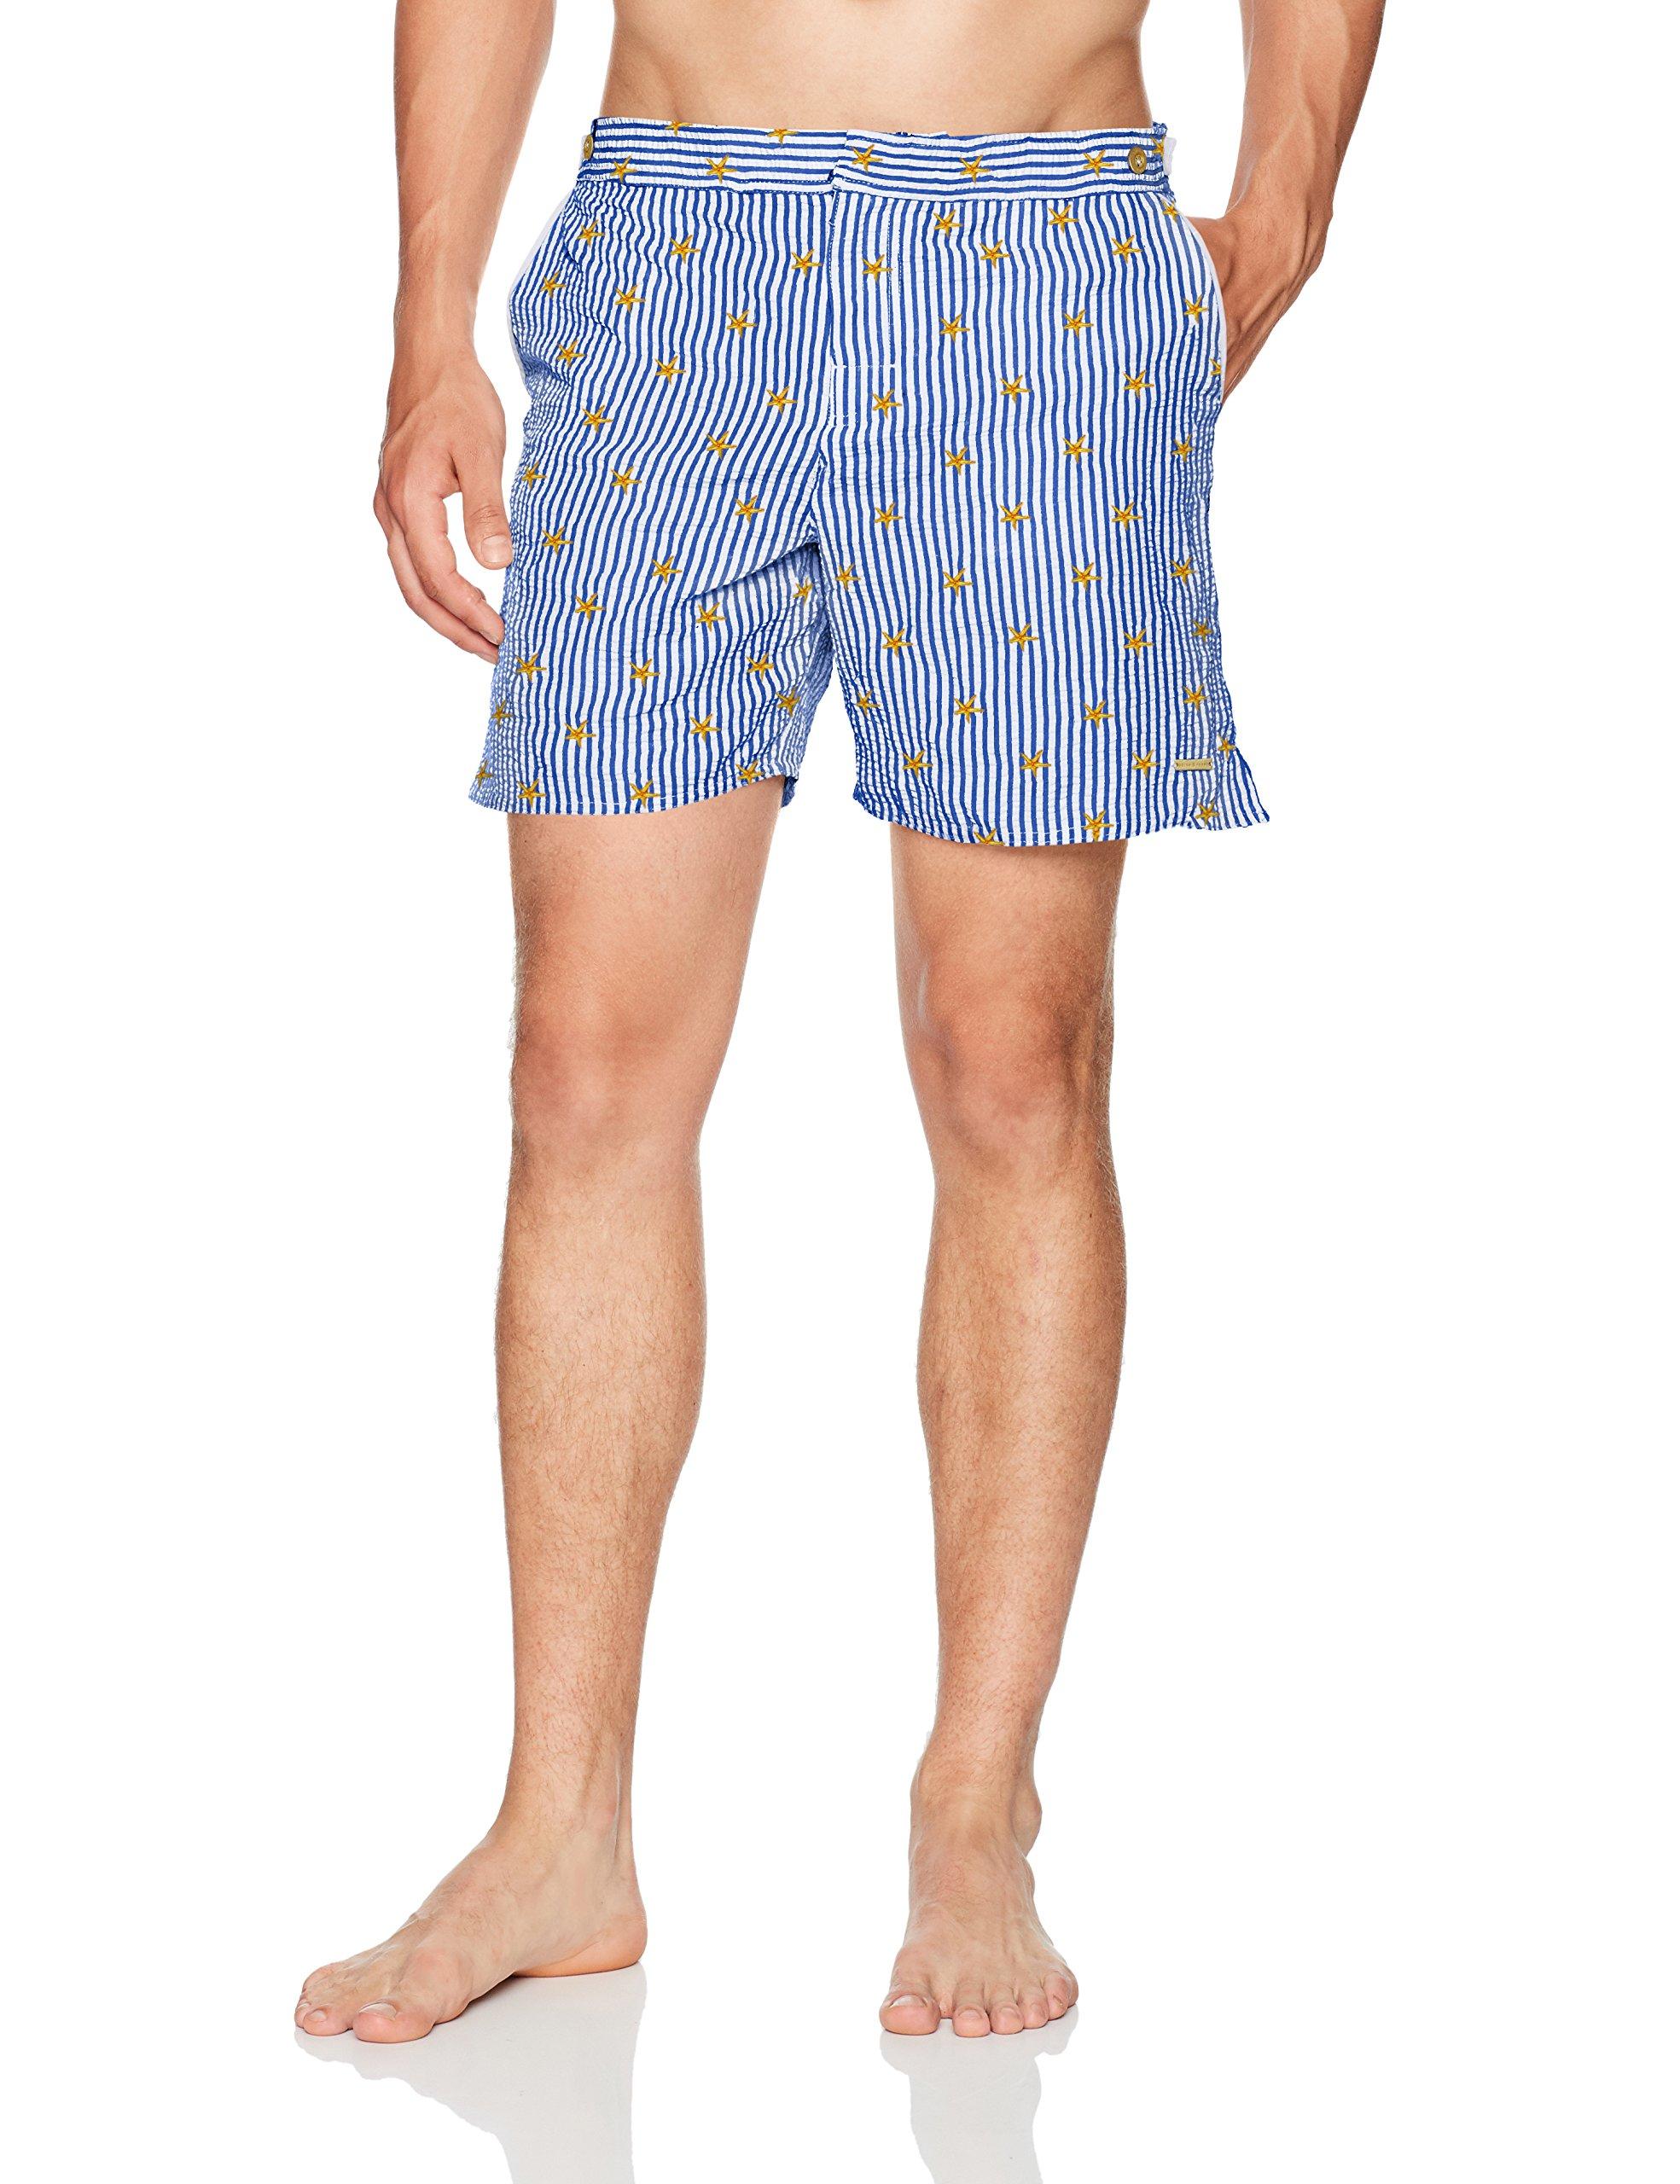 parke & ronen Men's Catalonia Embroidered 6-Inch Swim Short, Navystripestarfish, 34